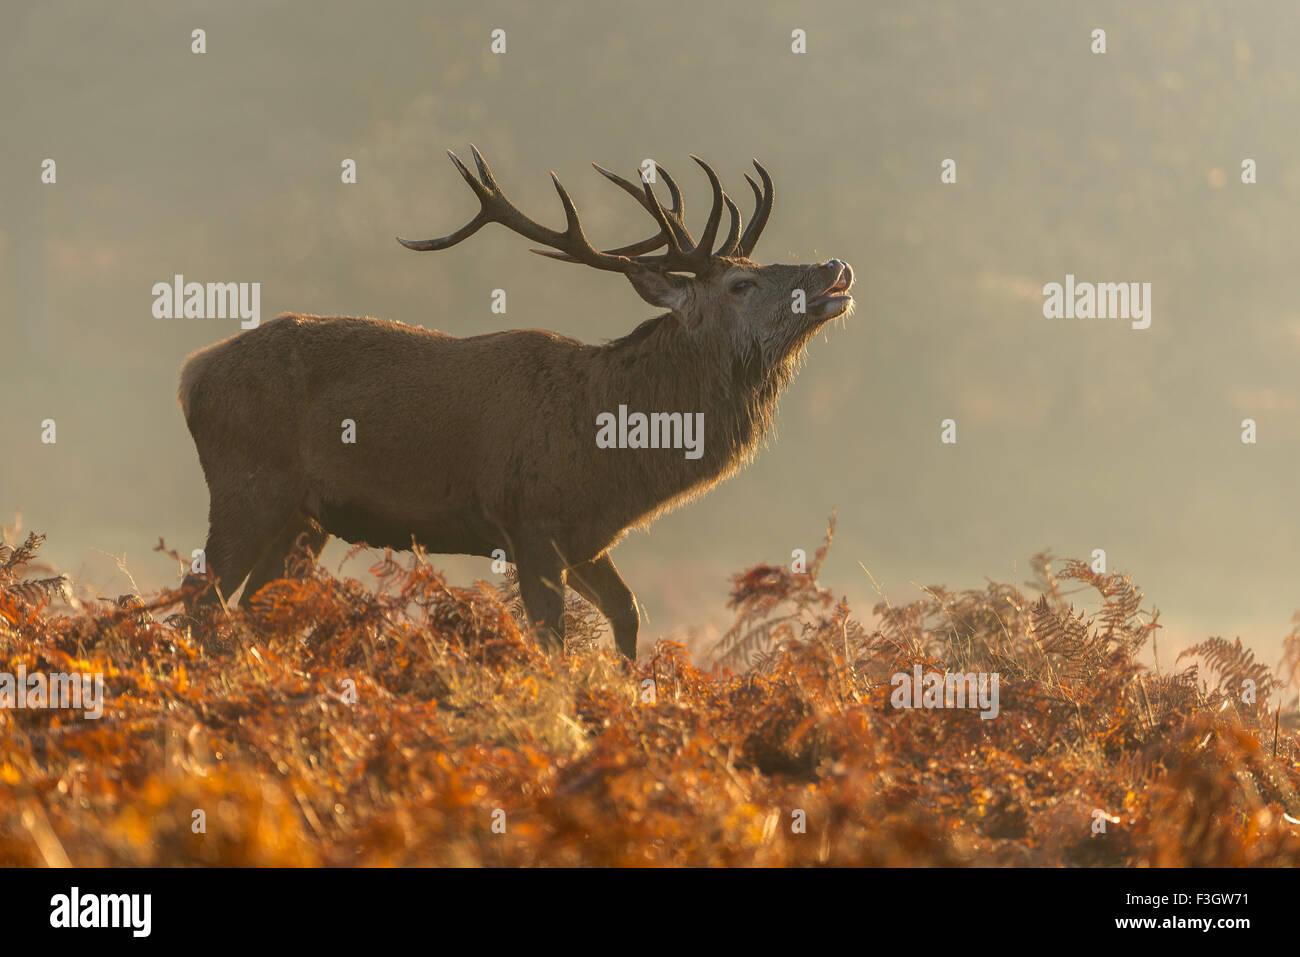 Red deer stag (Cervus elaphus) bellowing in autumnal setting - Stock Image